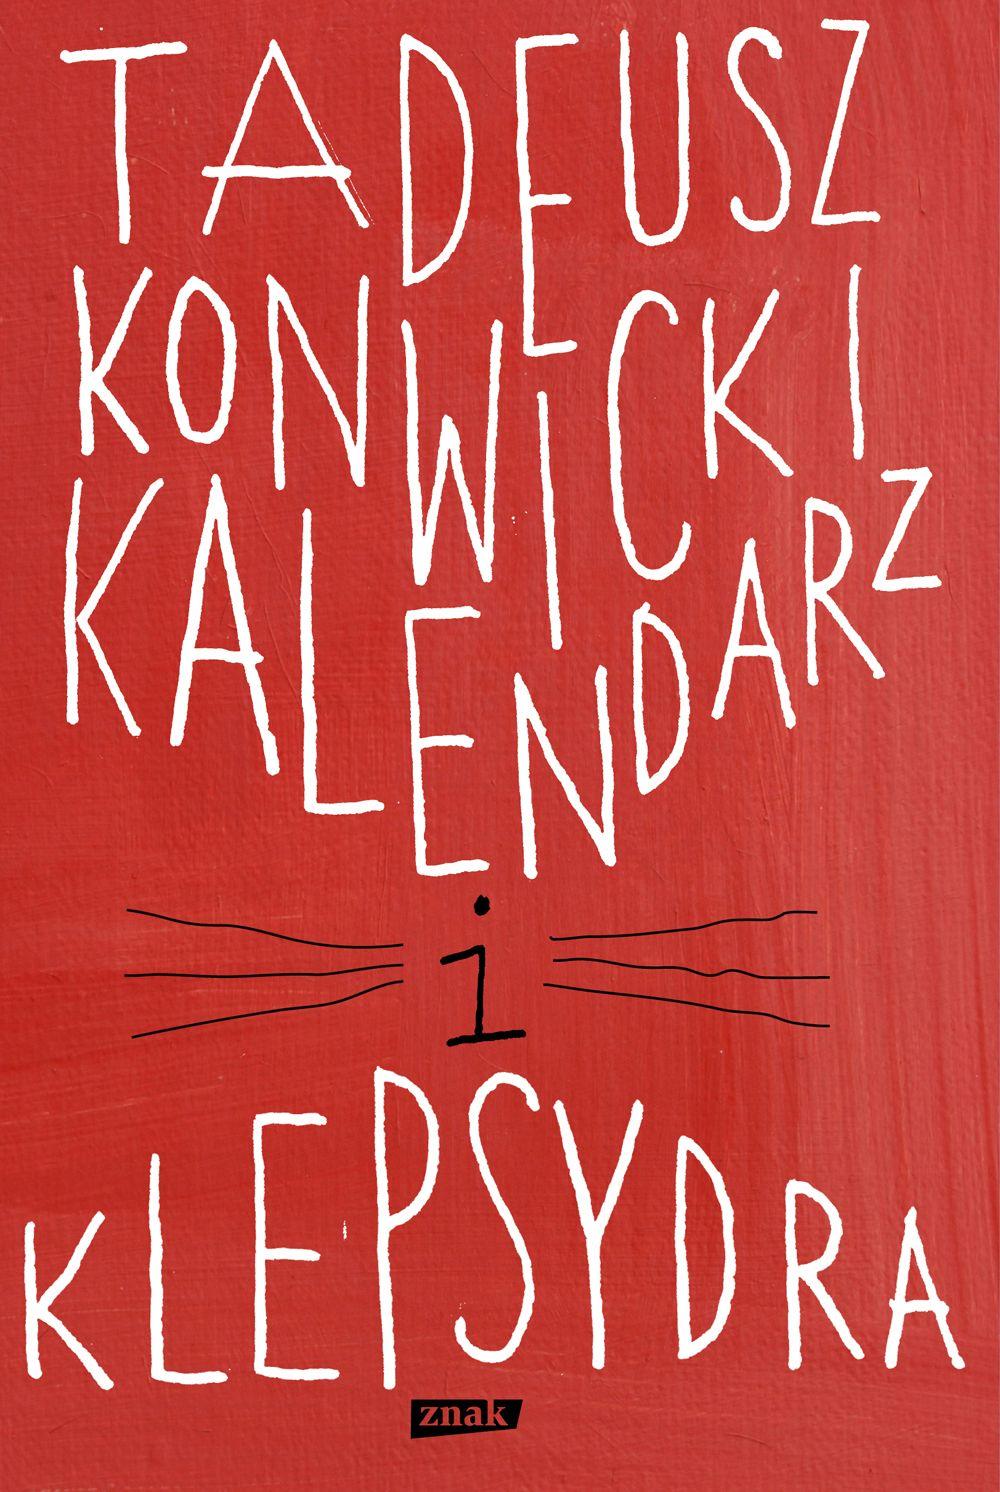 Tadeusz Konwicki – Kalendarz i klepsydra